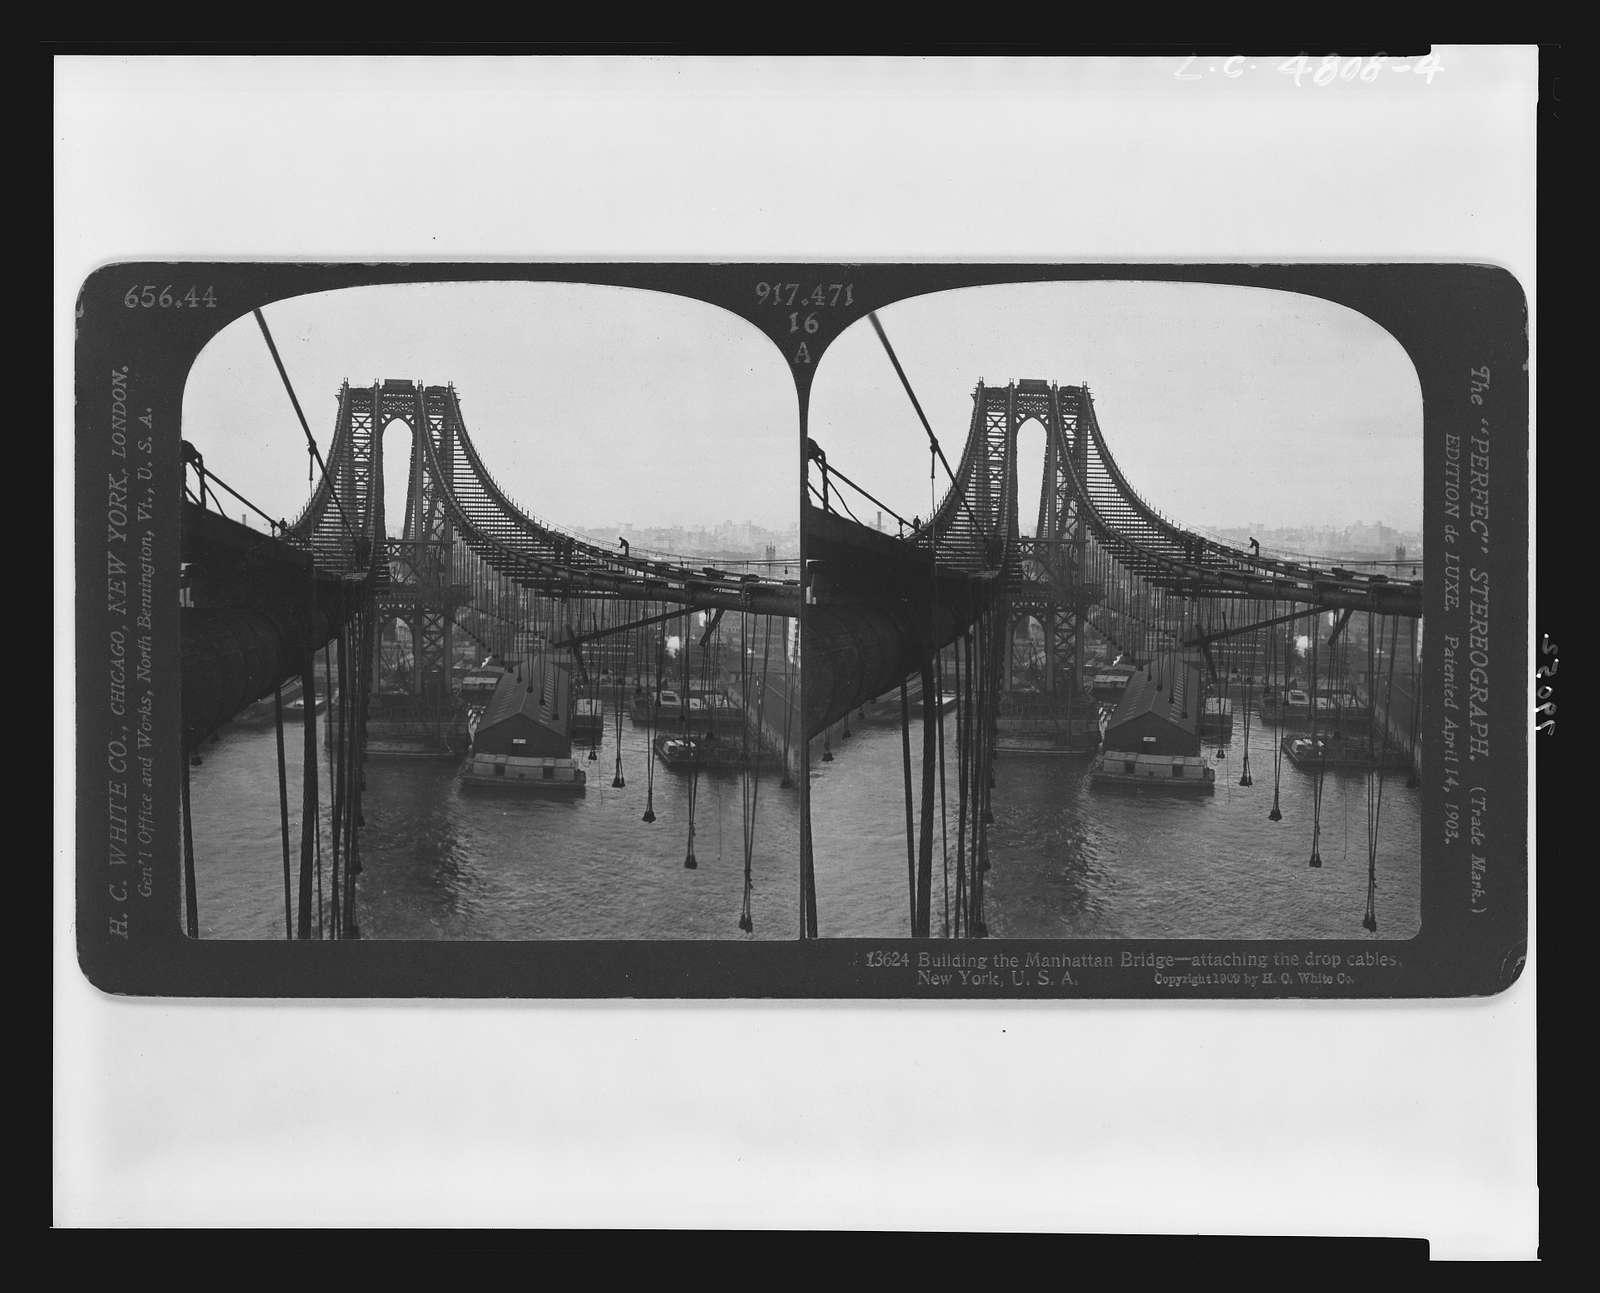 Building the Manhattan Bridge -- attaching the drop cables, New York, U.S.A